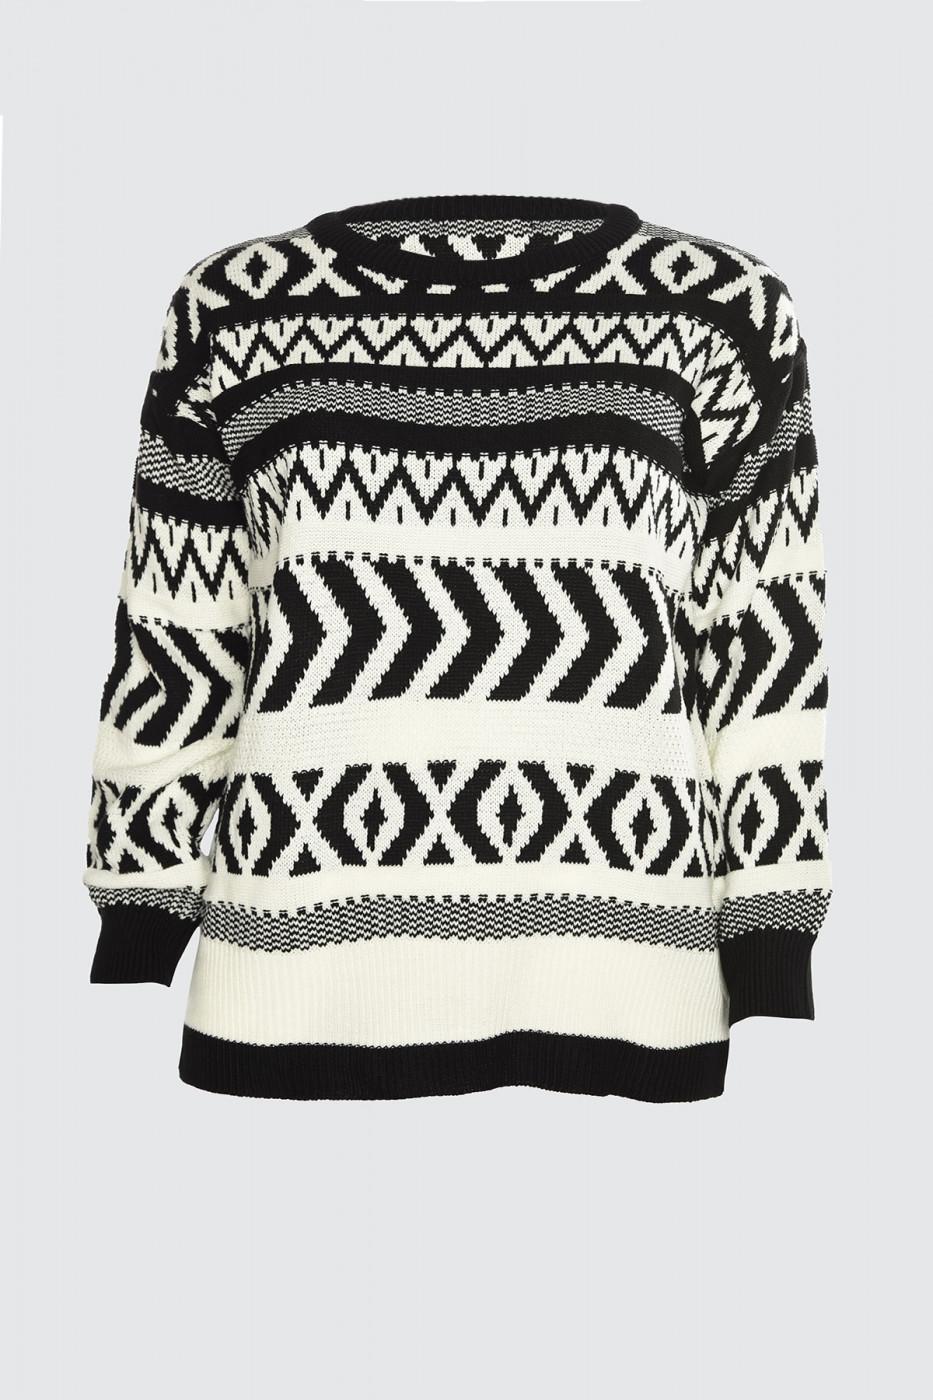 Trendyol Black Jacquard Knit Sweater